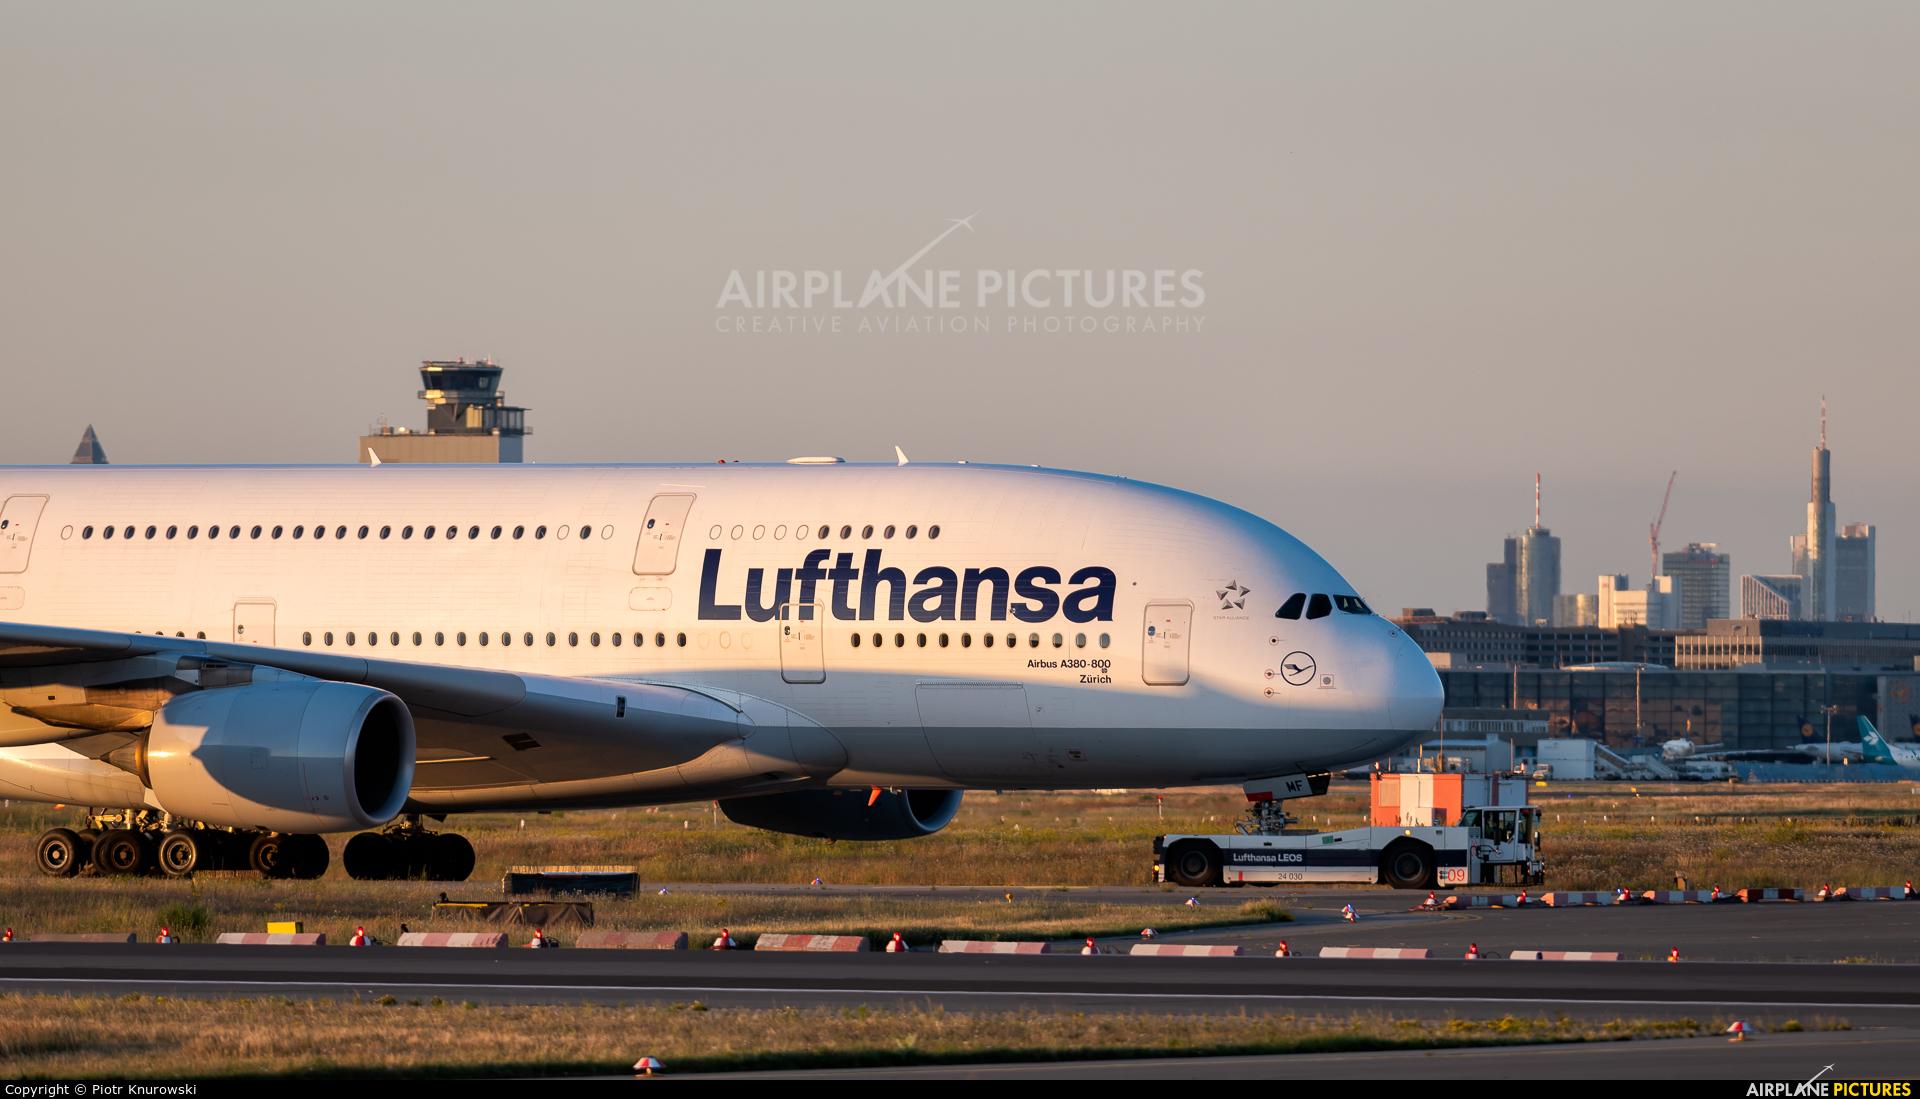 Lufthansa D-AIMF aircraft at Frankfurt